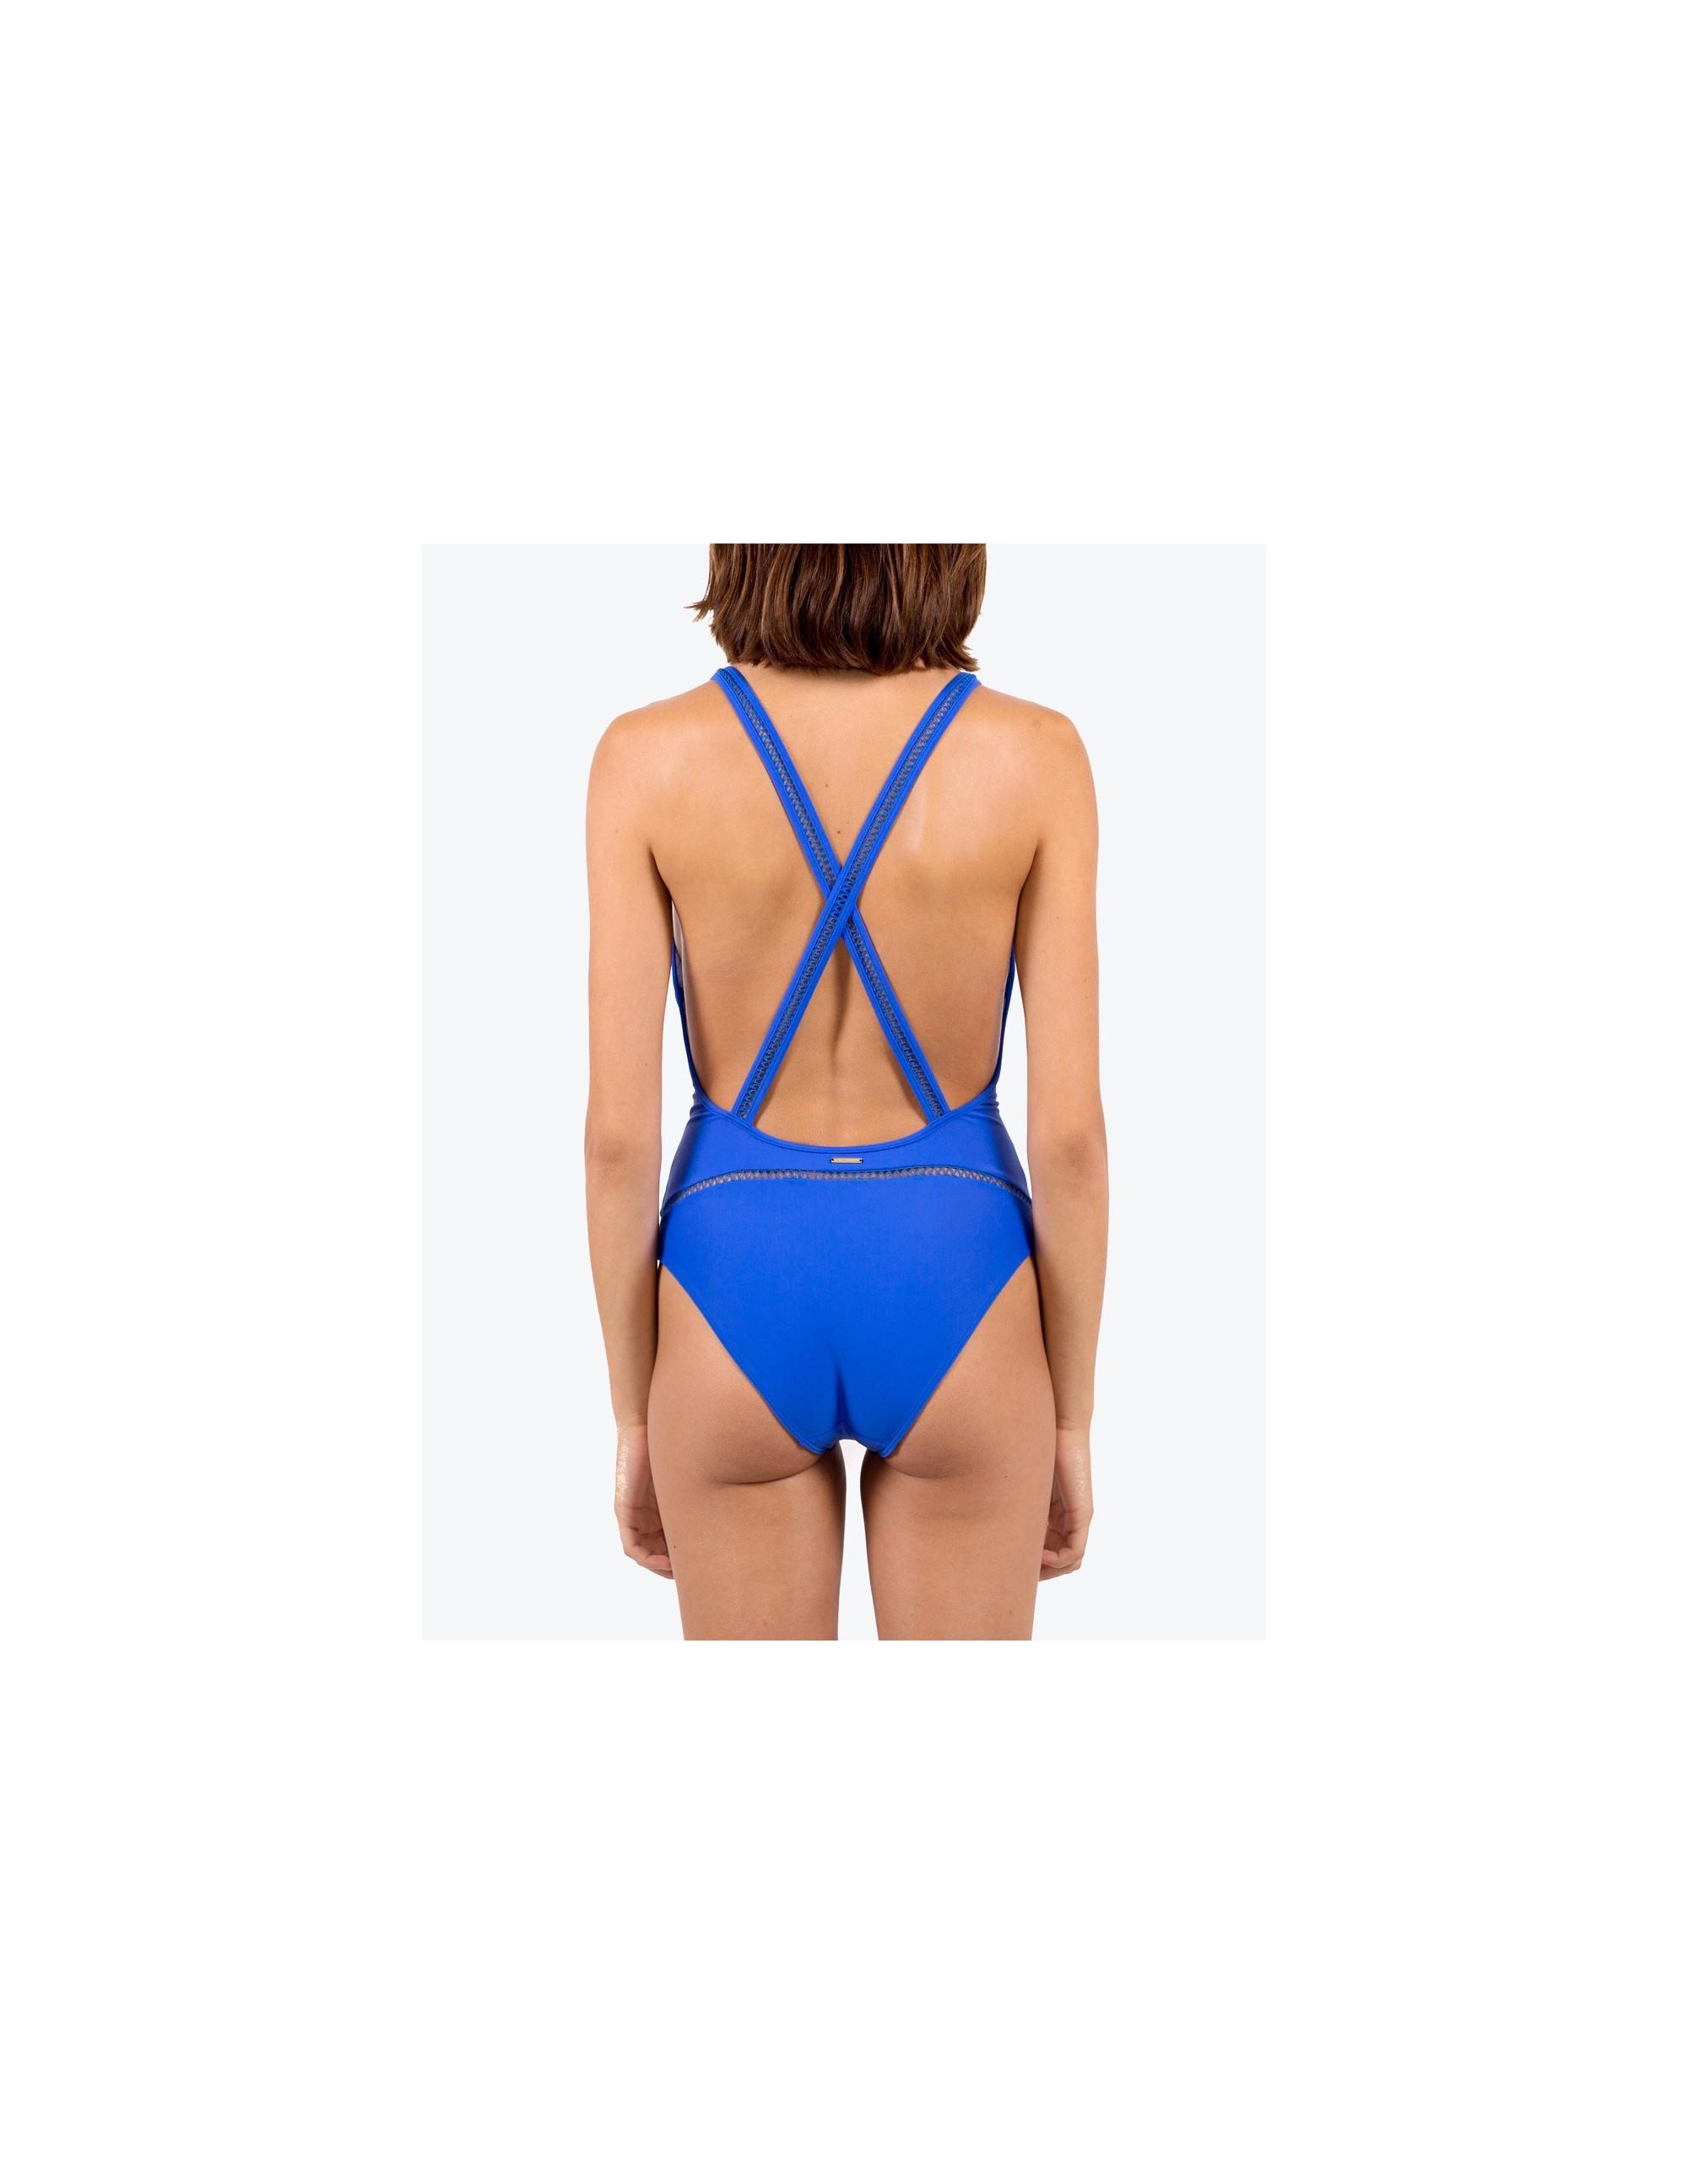 SICILY swimsuit - ECHO BLUE